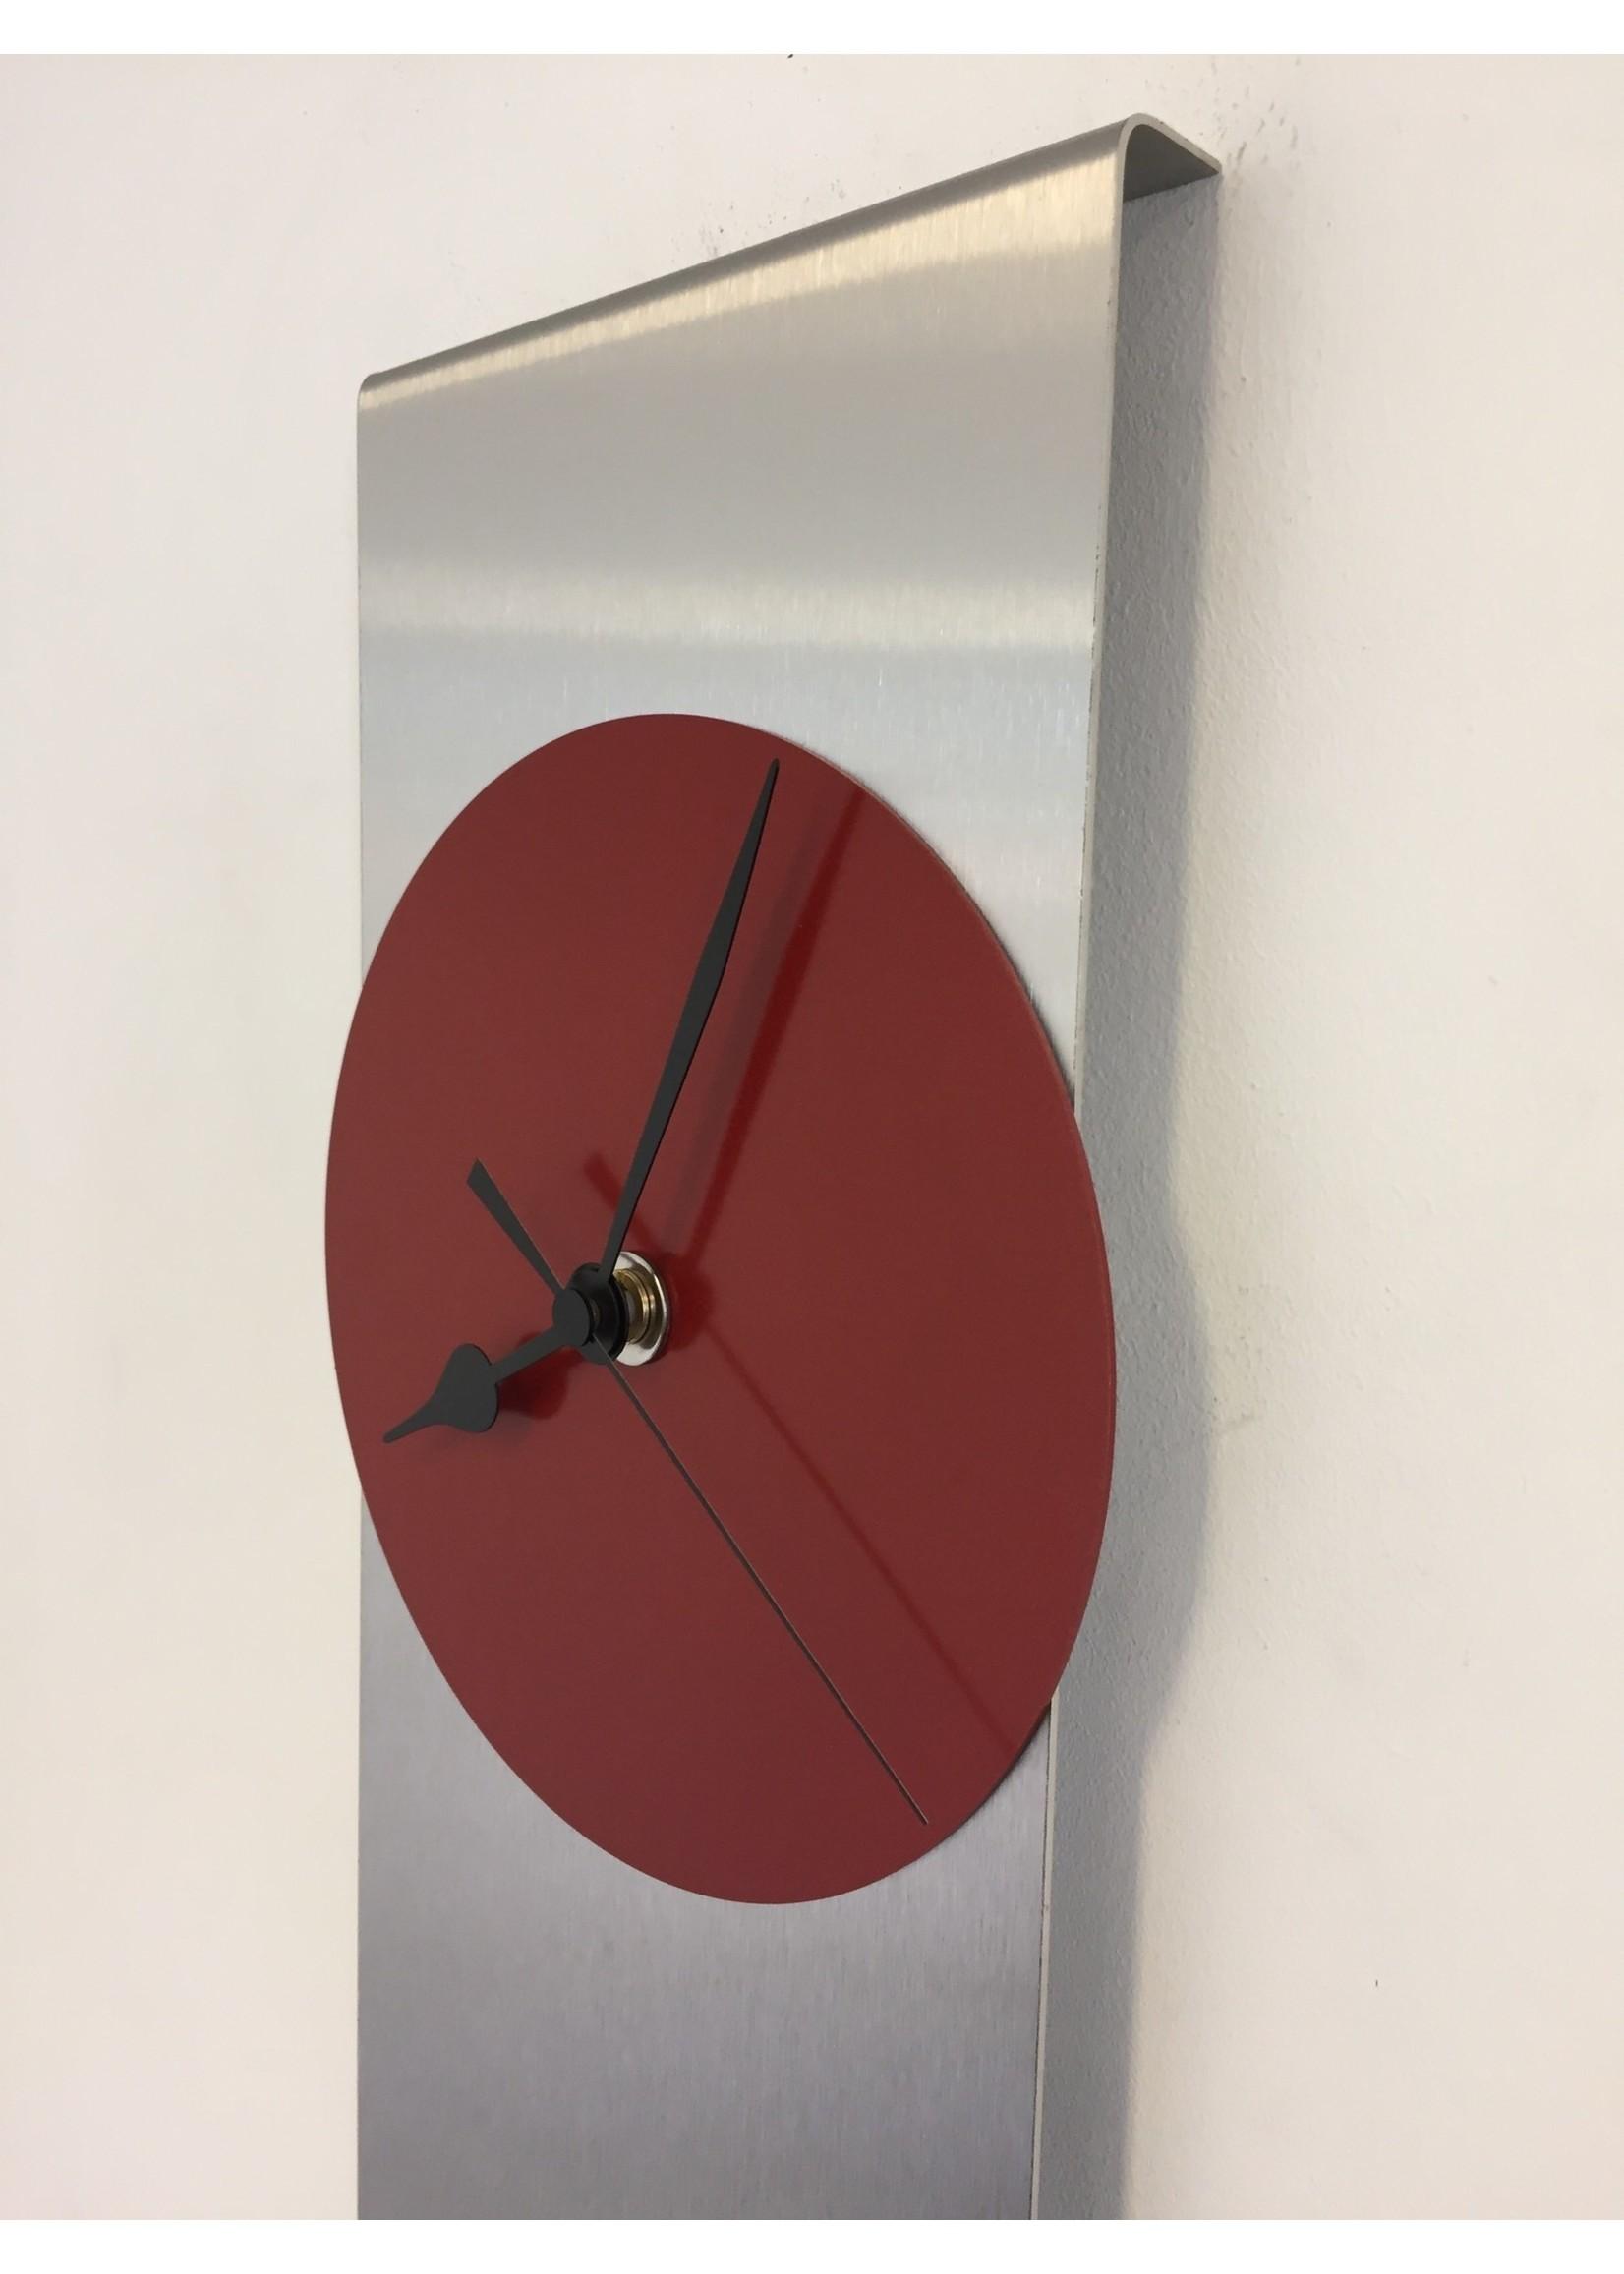 Klokkendiscounter Wandklok ORION RED & BLACK Modern Dutch Design